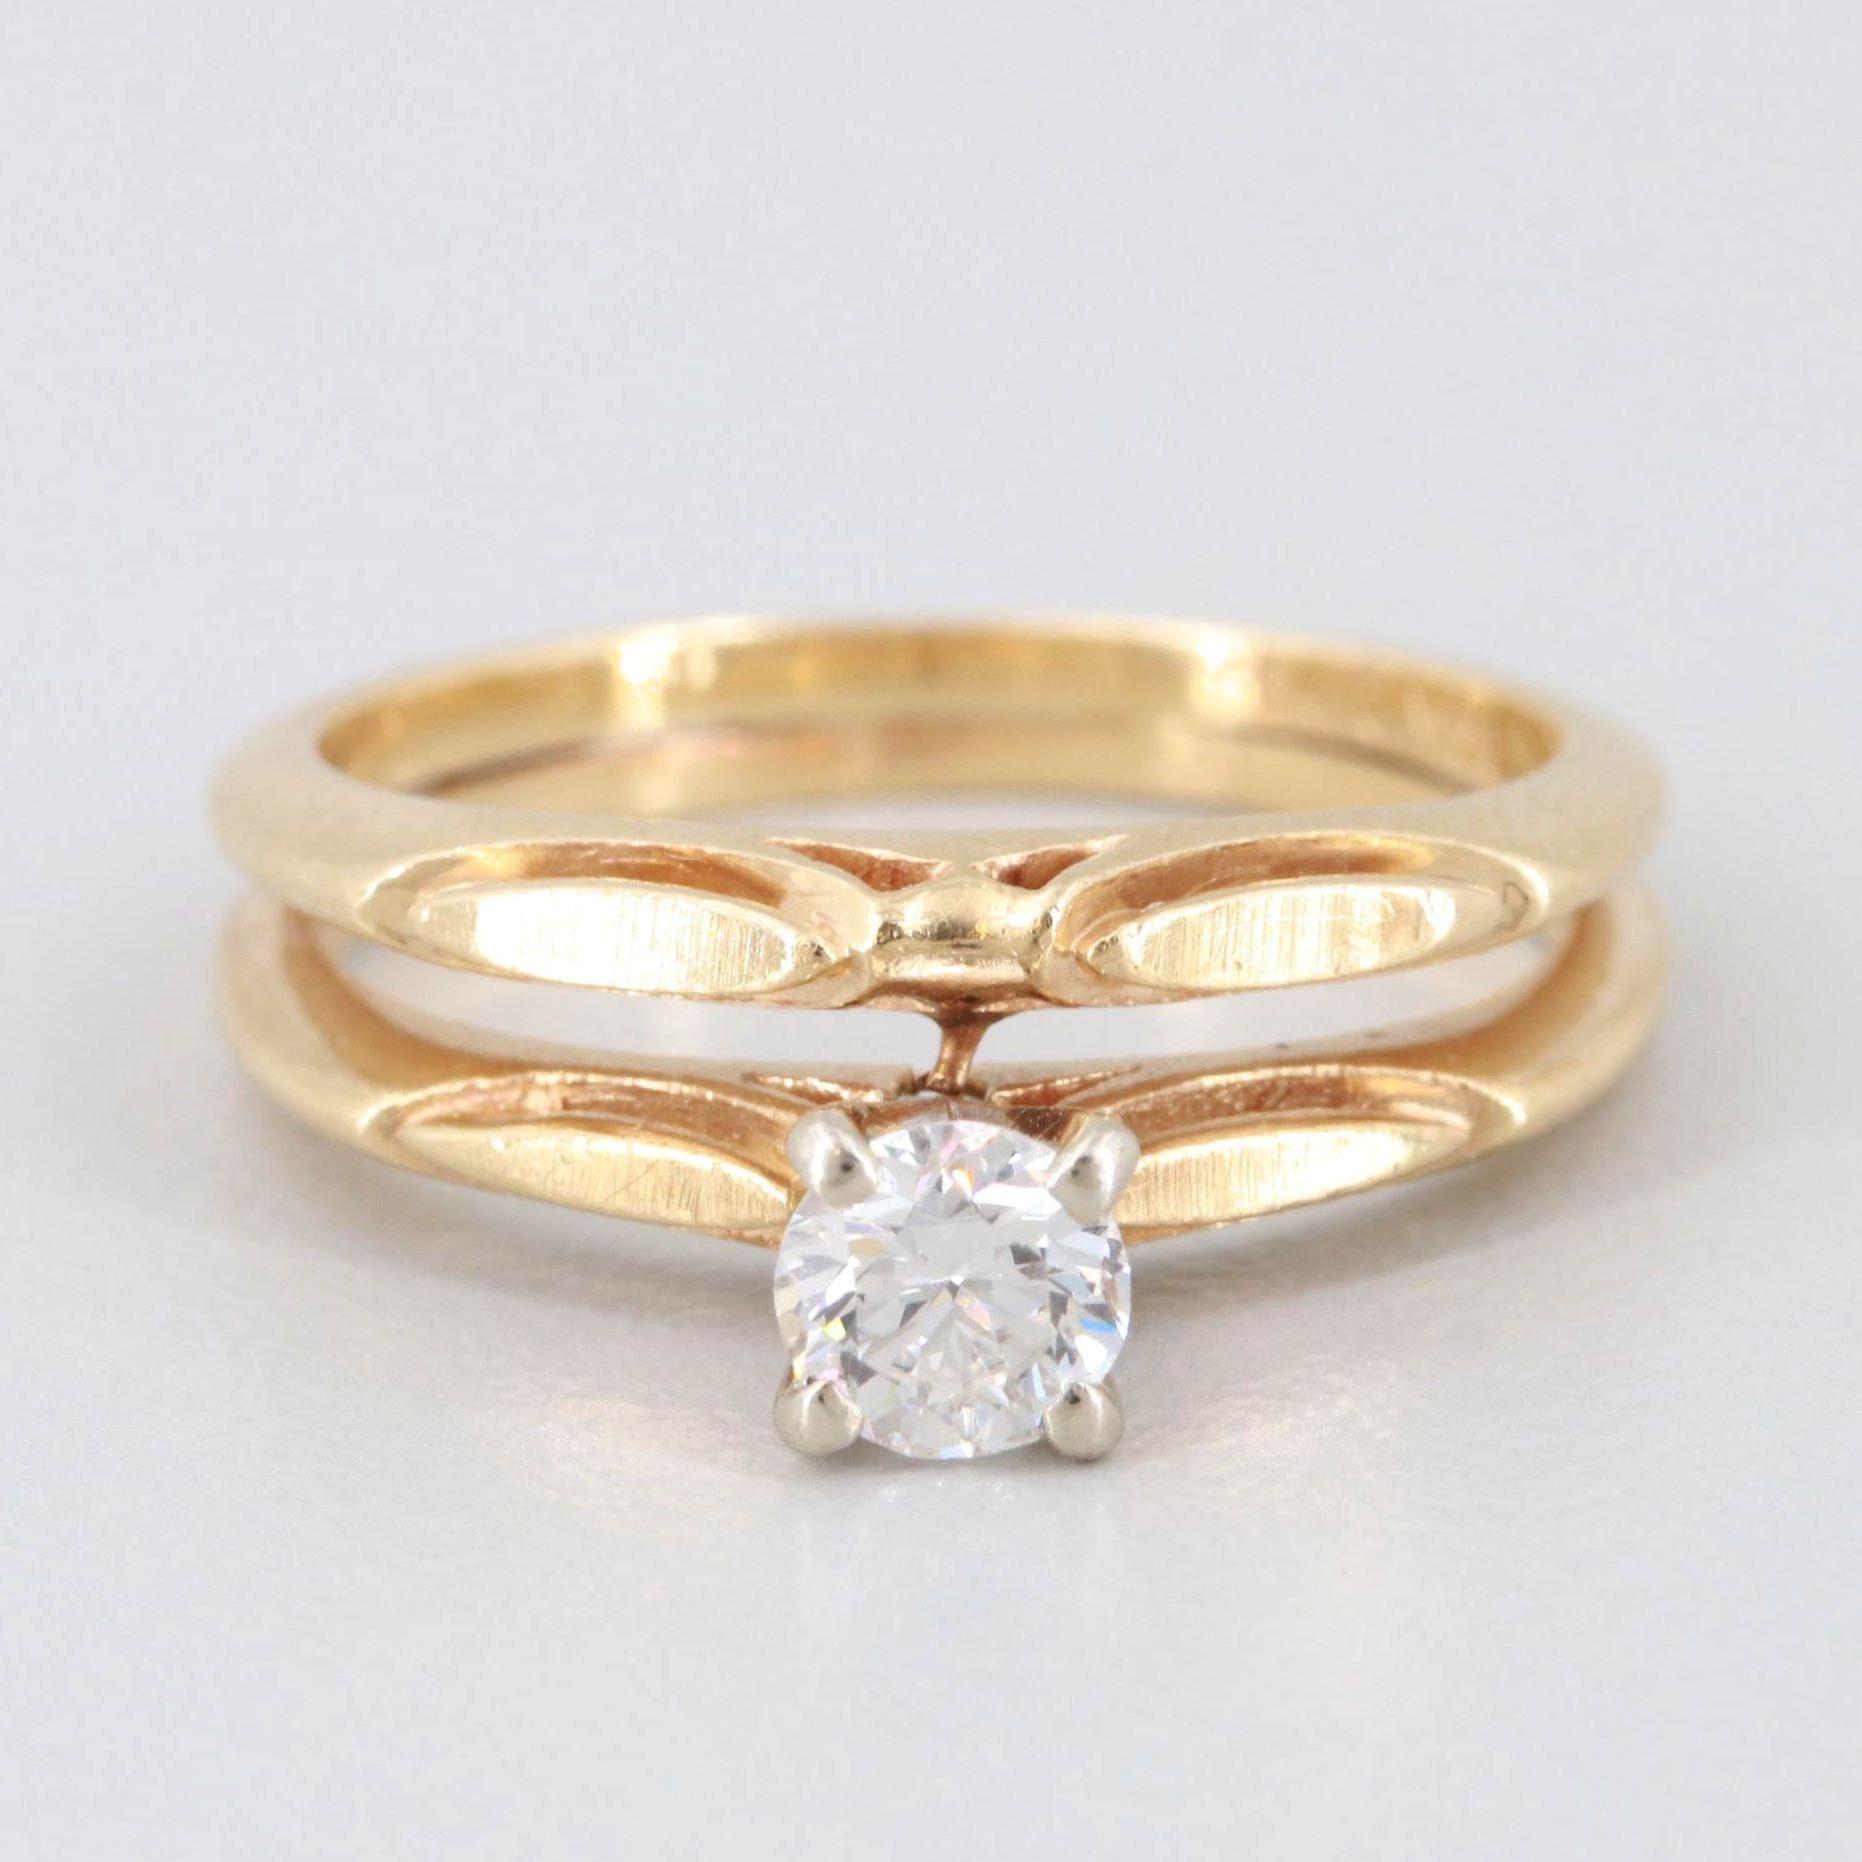 Vintage 14K Yellow Gold Diamond Soldered Ring Set